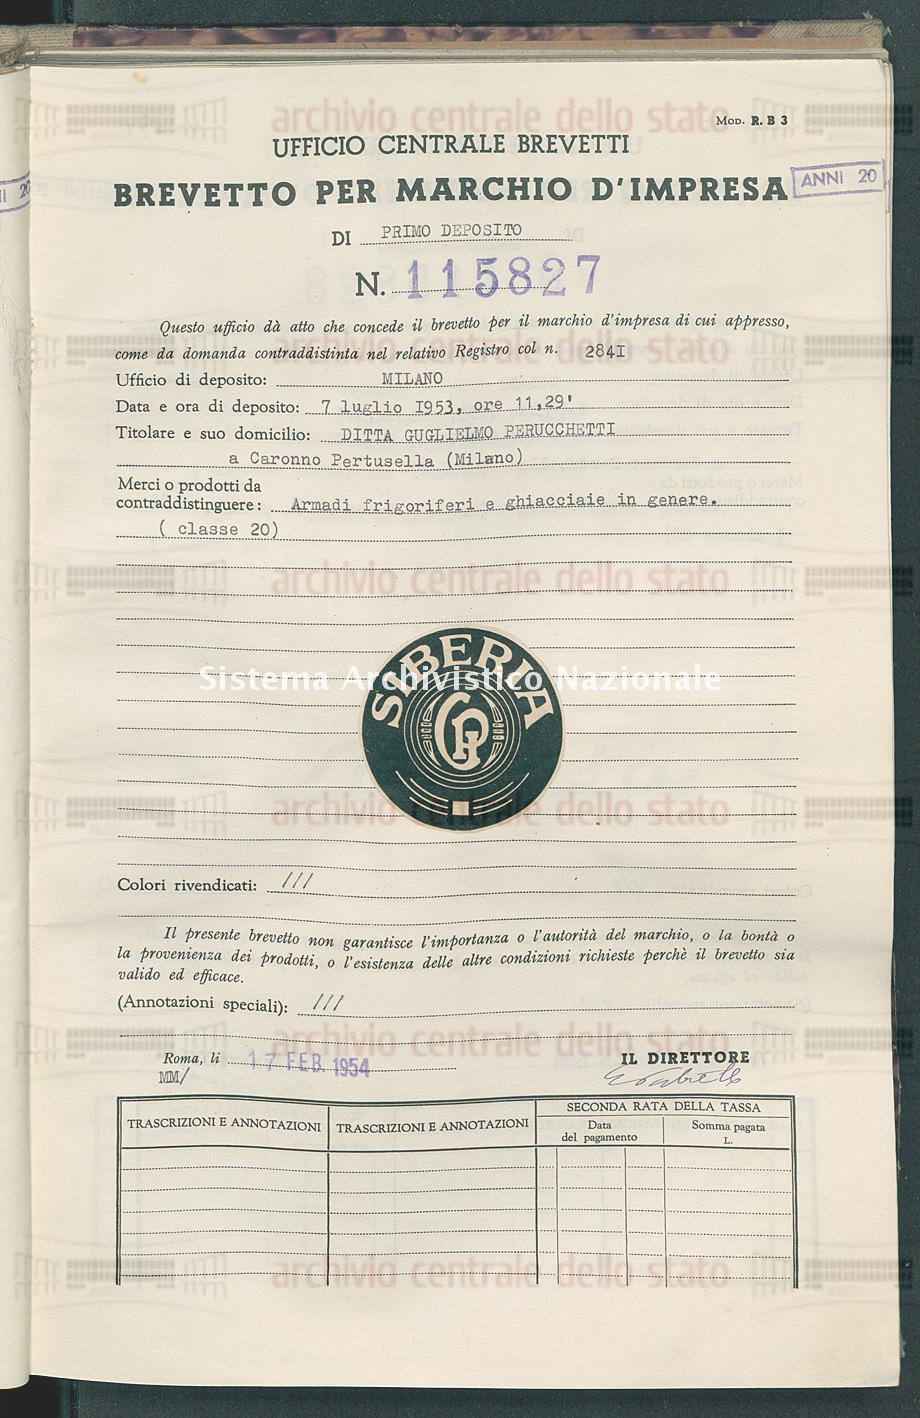 Armadi frigoriferi e ghiacciaie in genere Ditta Guglielmo Perucchetti (17/02/1954)